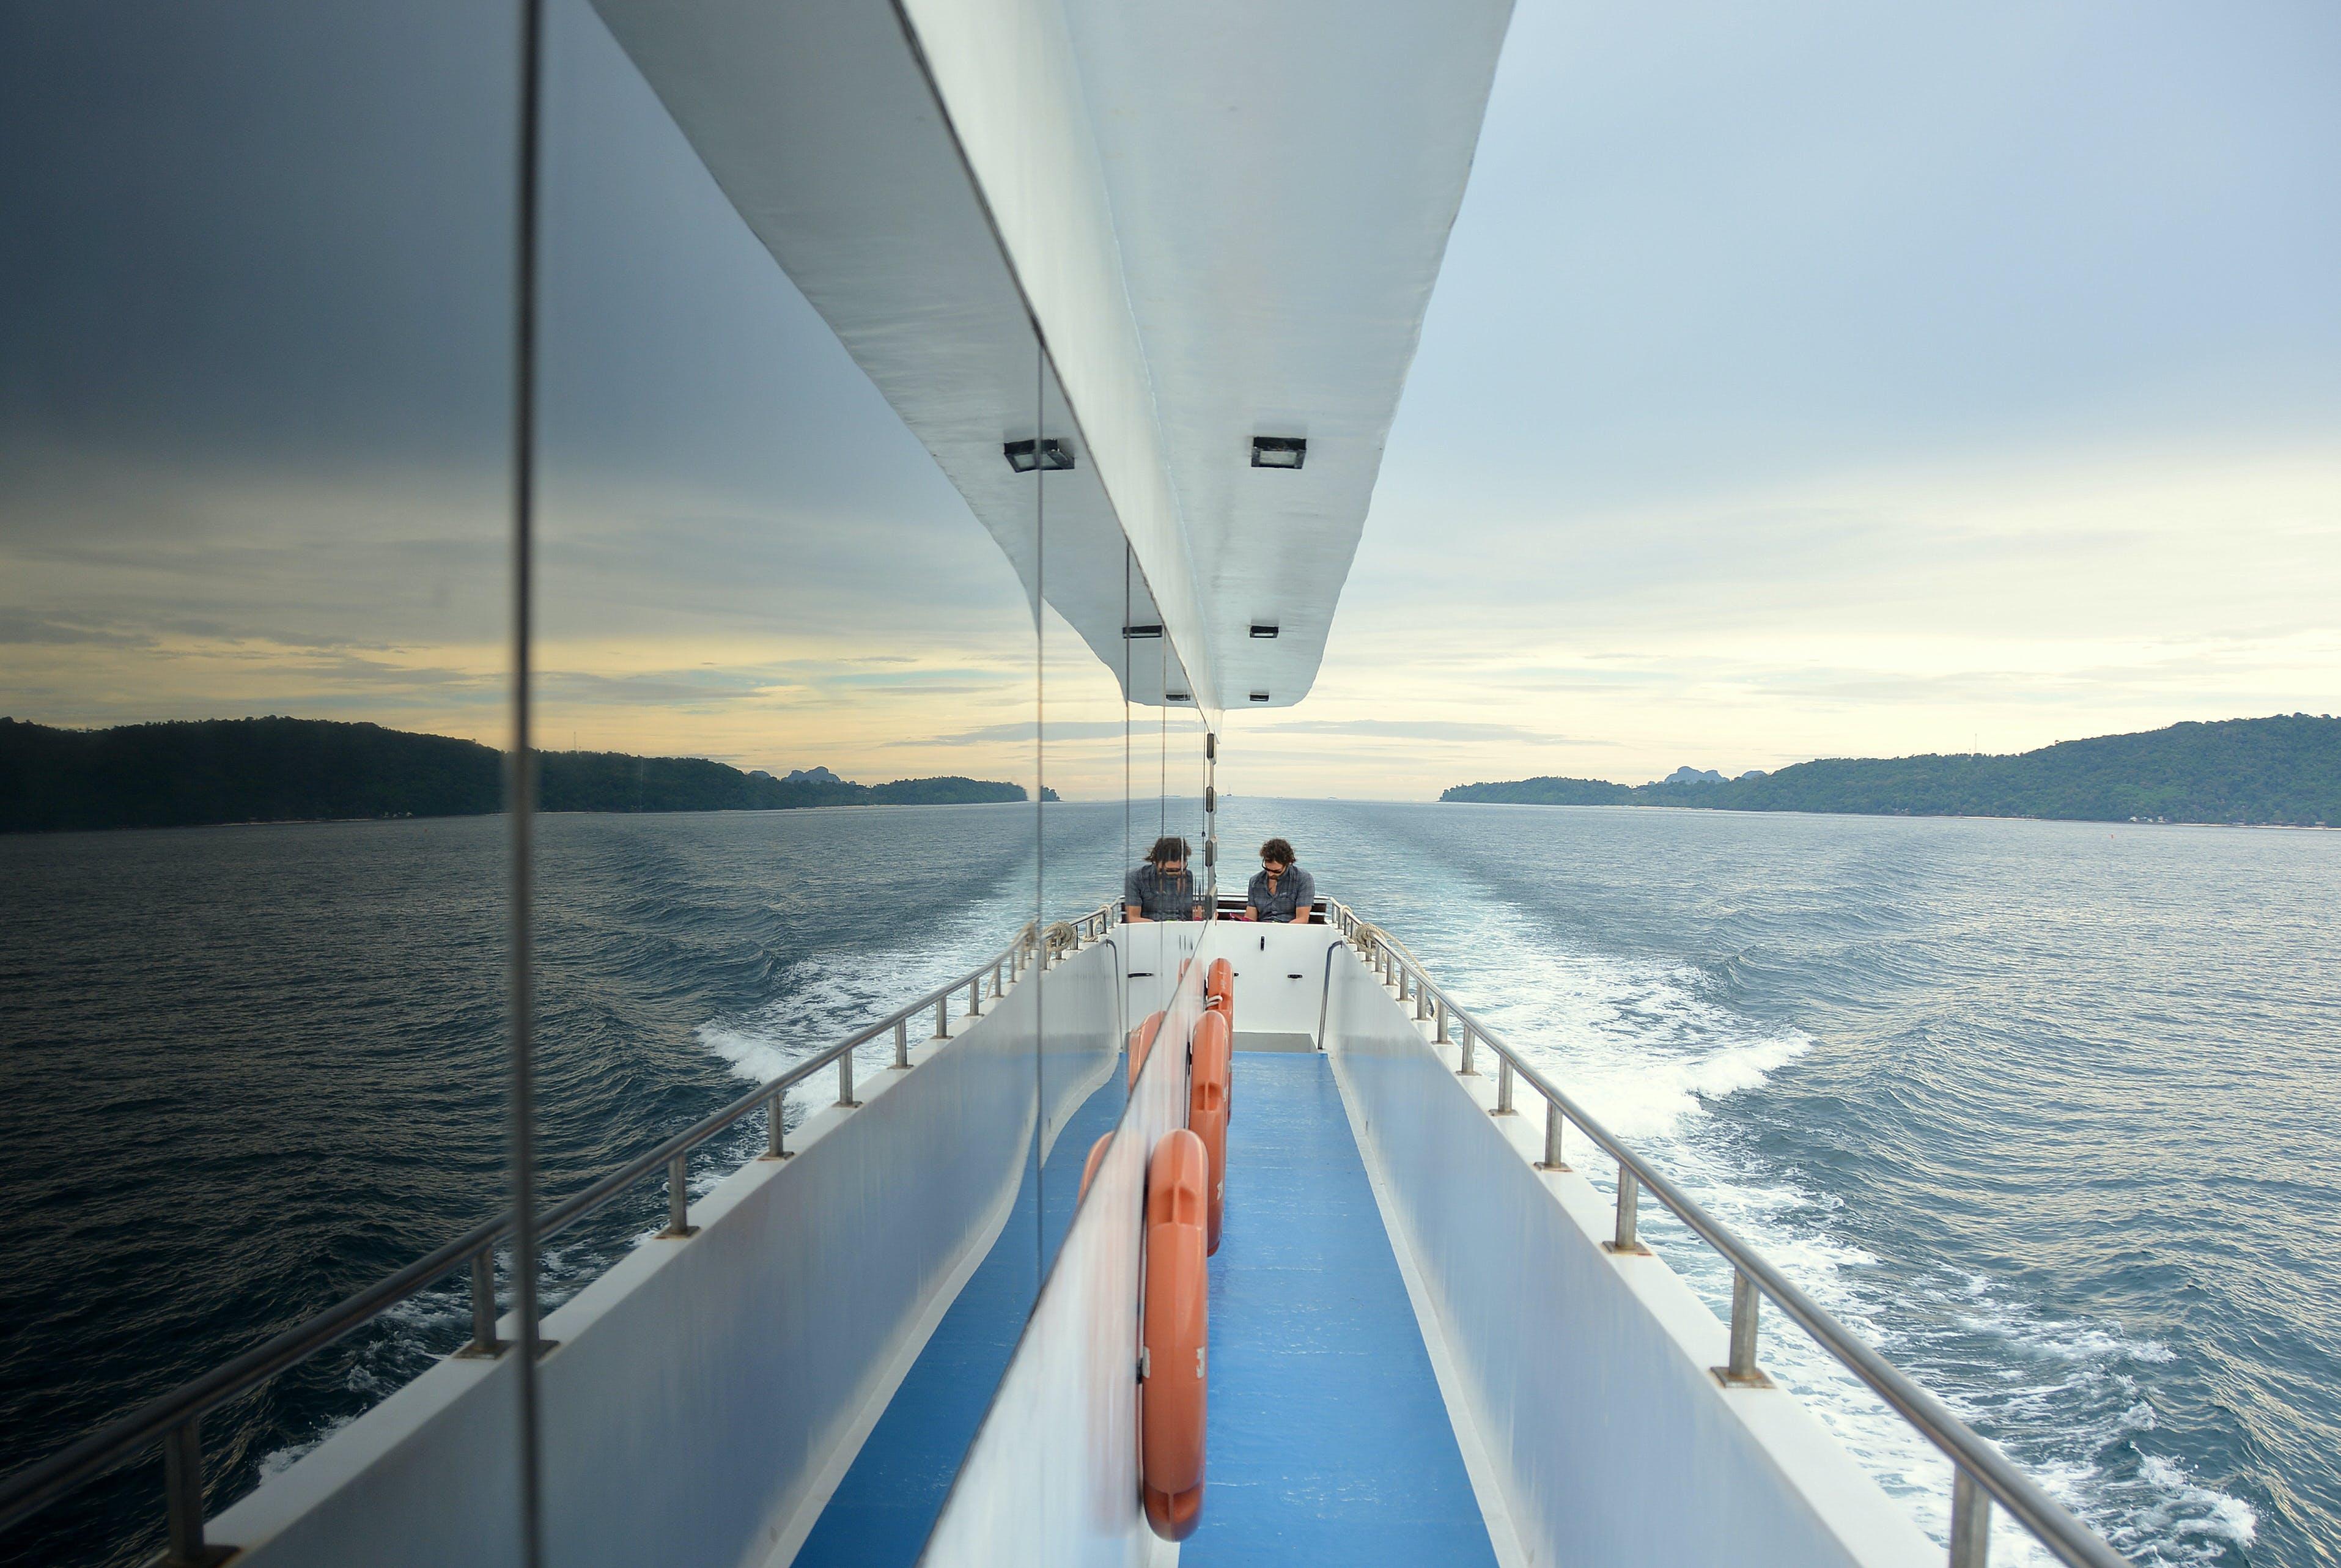 adventure, boat, deck